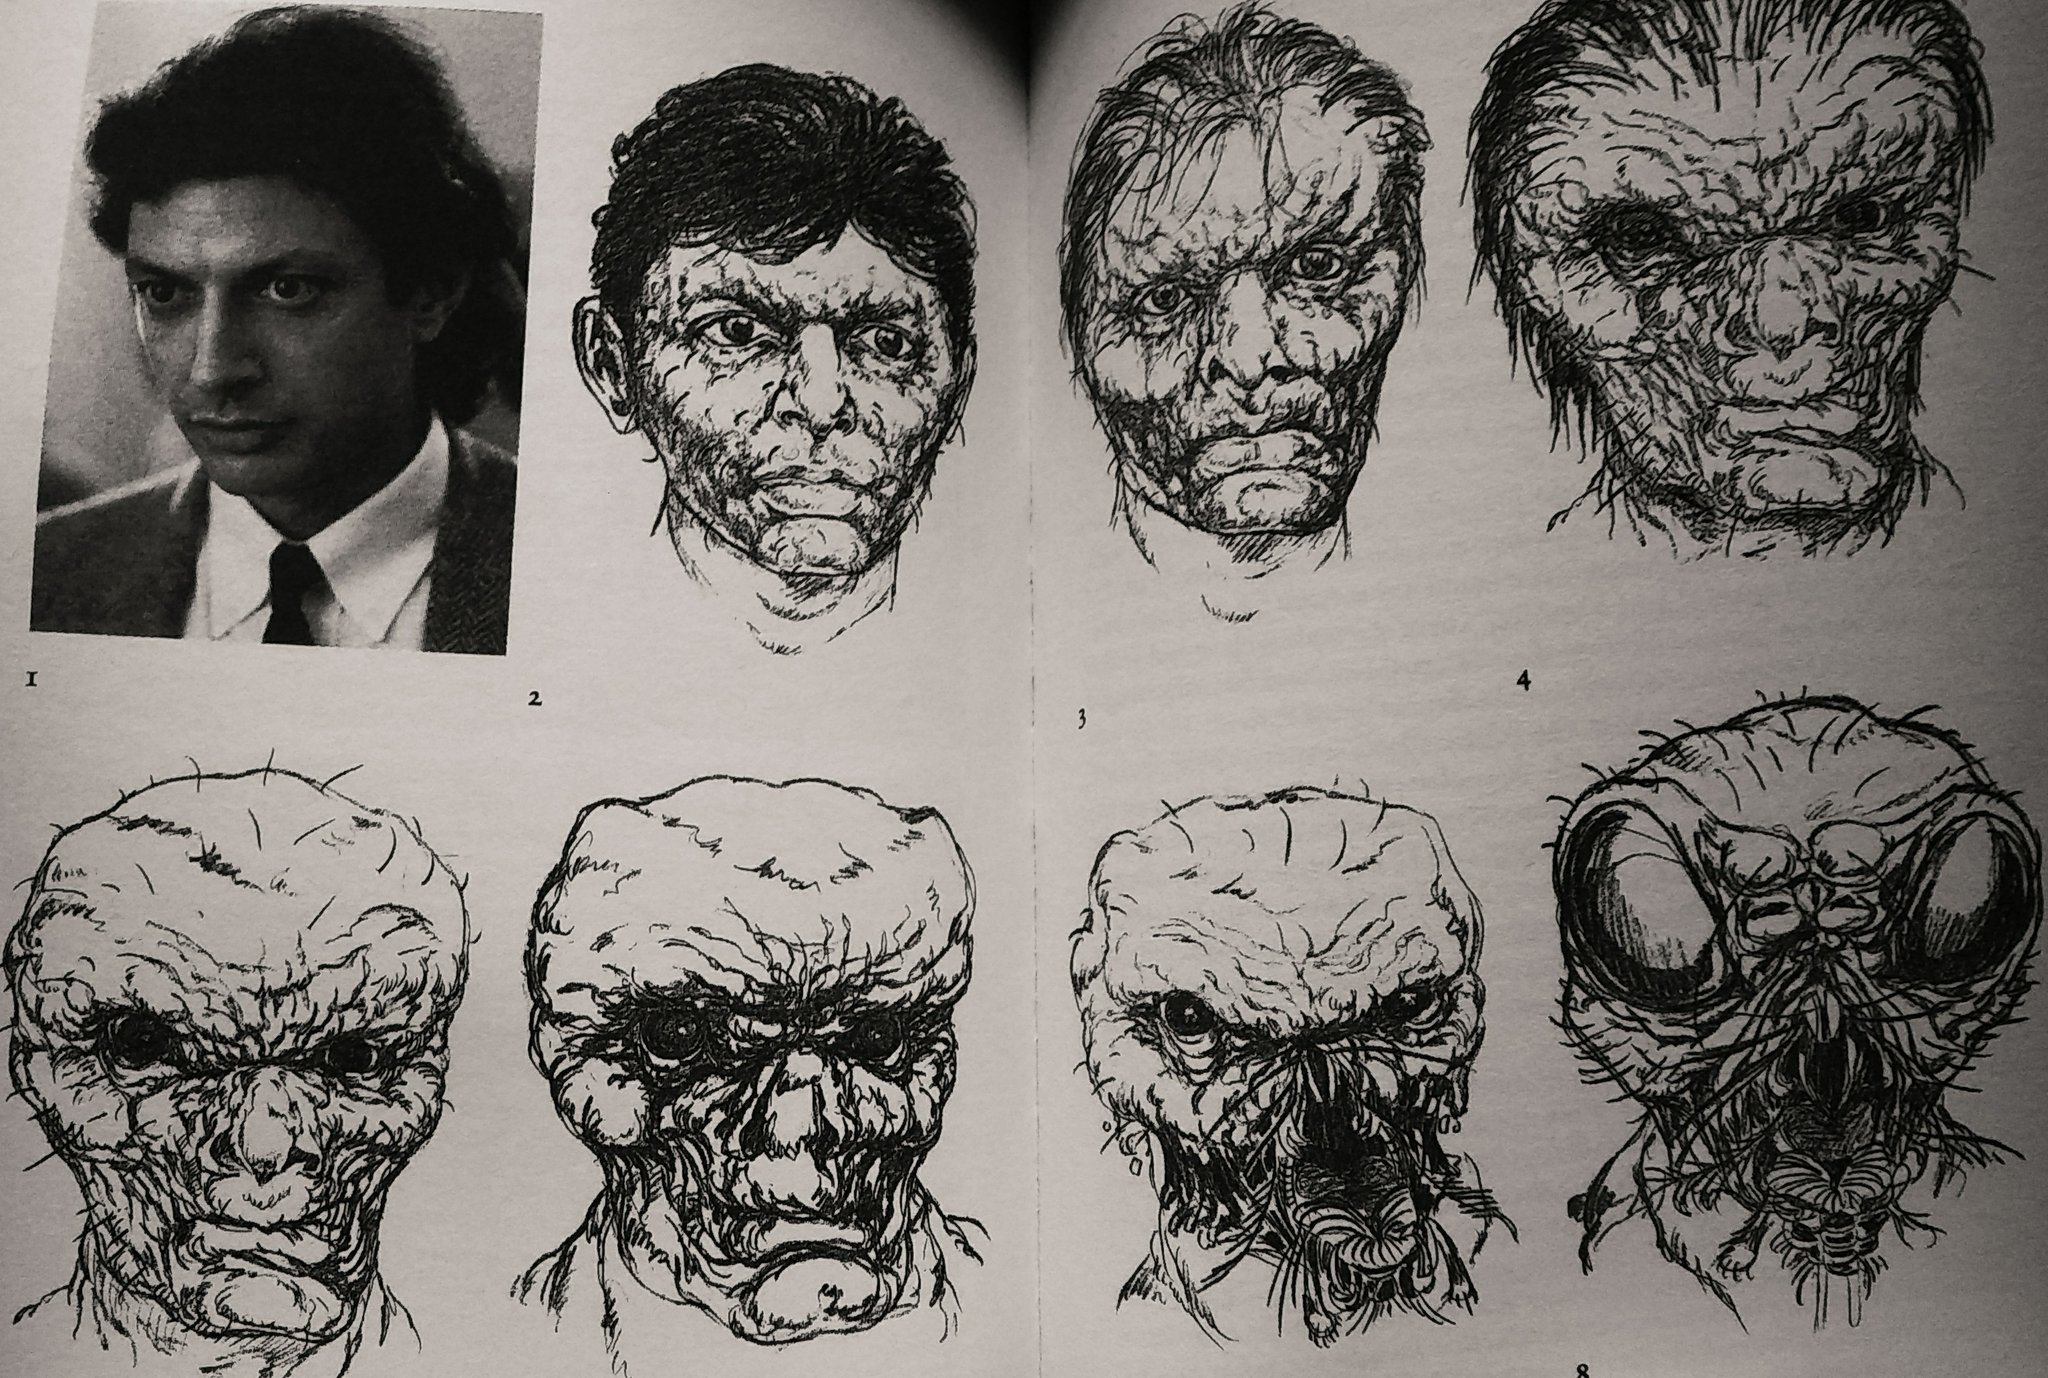 The 8 stages of Seth Brundle becoming Brundle-Fly.  Art by: makeup designer Chris Walas https://t.co/9jvb24POVr